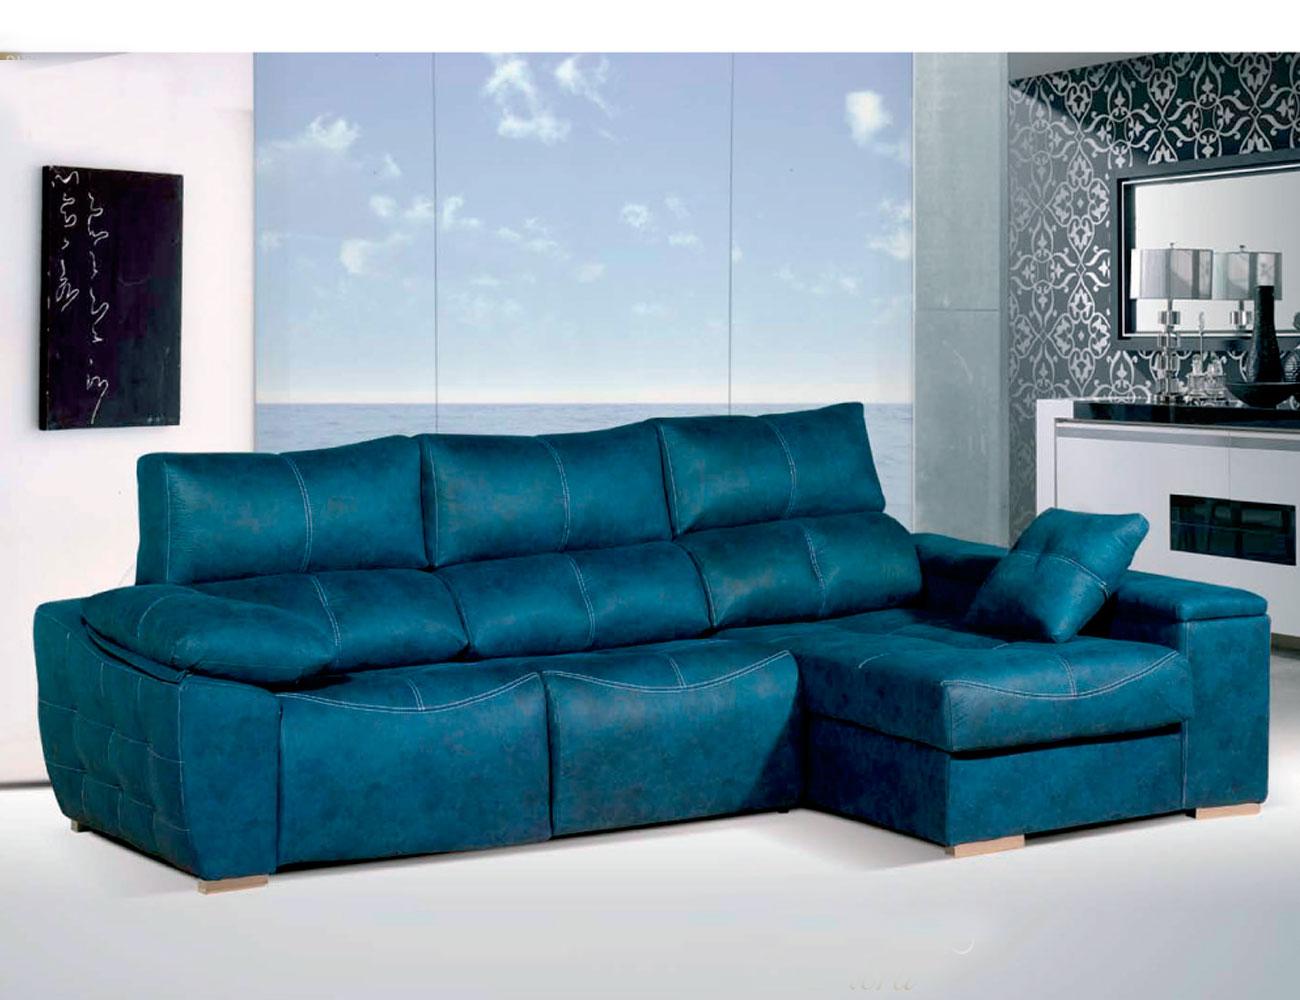 Sofa chaiselongue relax 2 motores anti manchas turquesa19